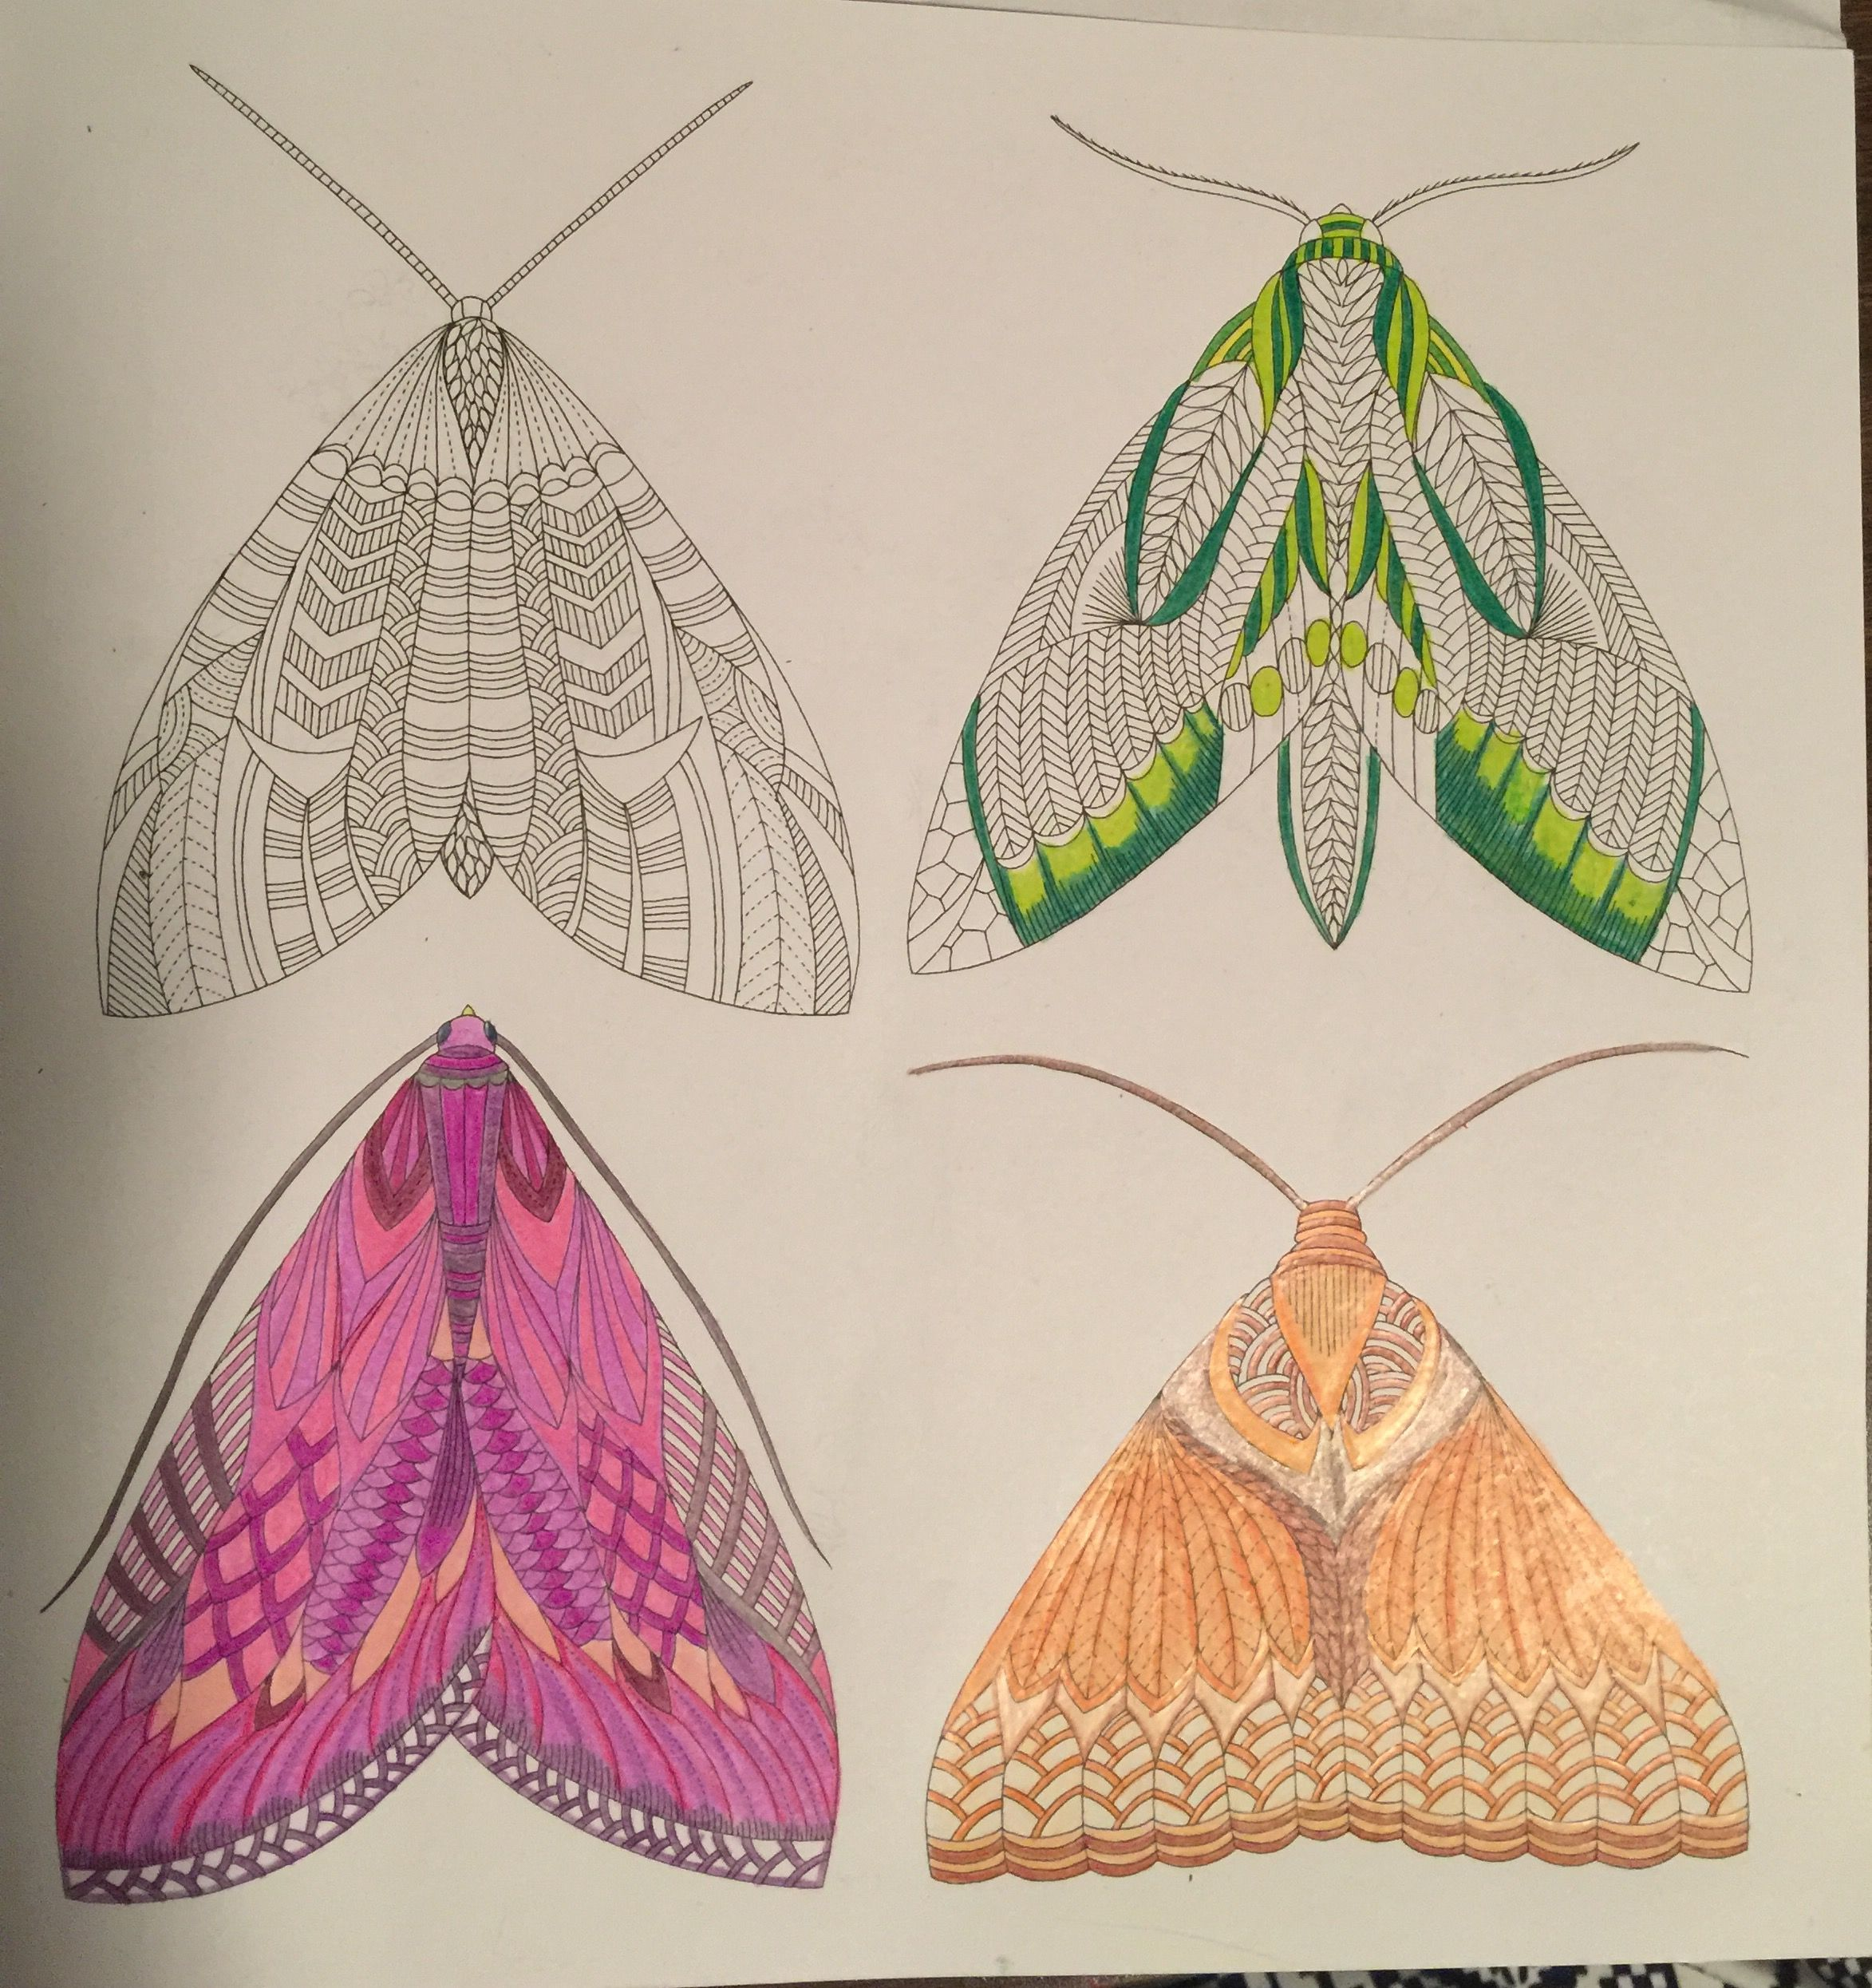 Color me draw me animal kingdom book - Animal Kingdom Millie Marotta Color Me Draw Moths Coloring Book